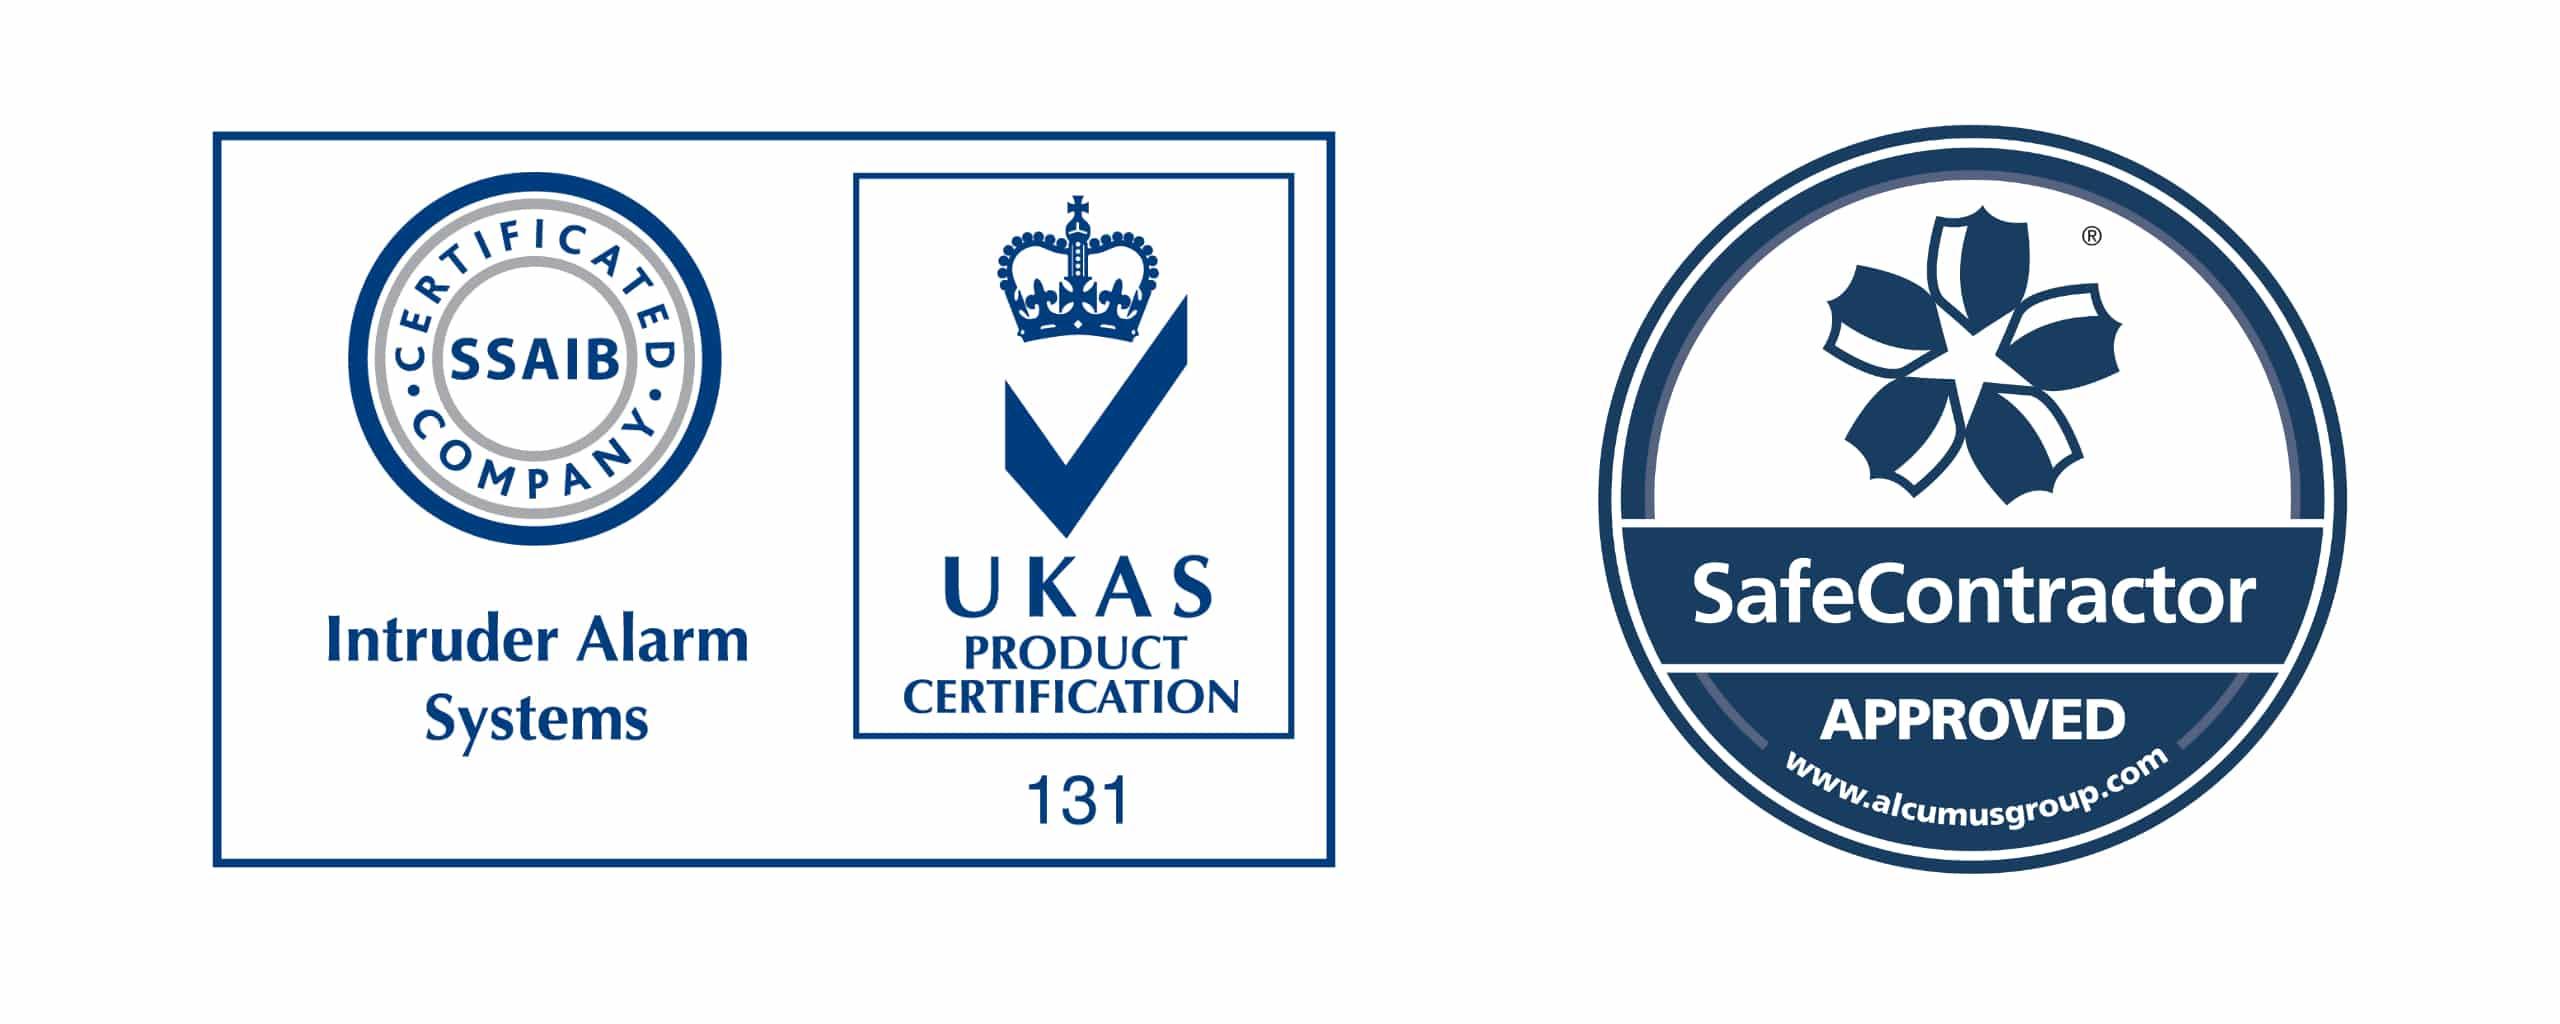 Seen Security - Safe Contractor Accreditation & UKAS Intruder Alarms Certified